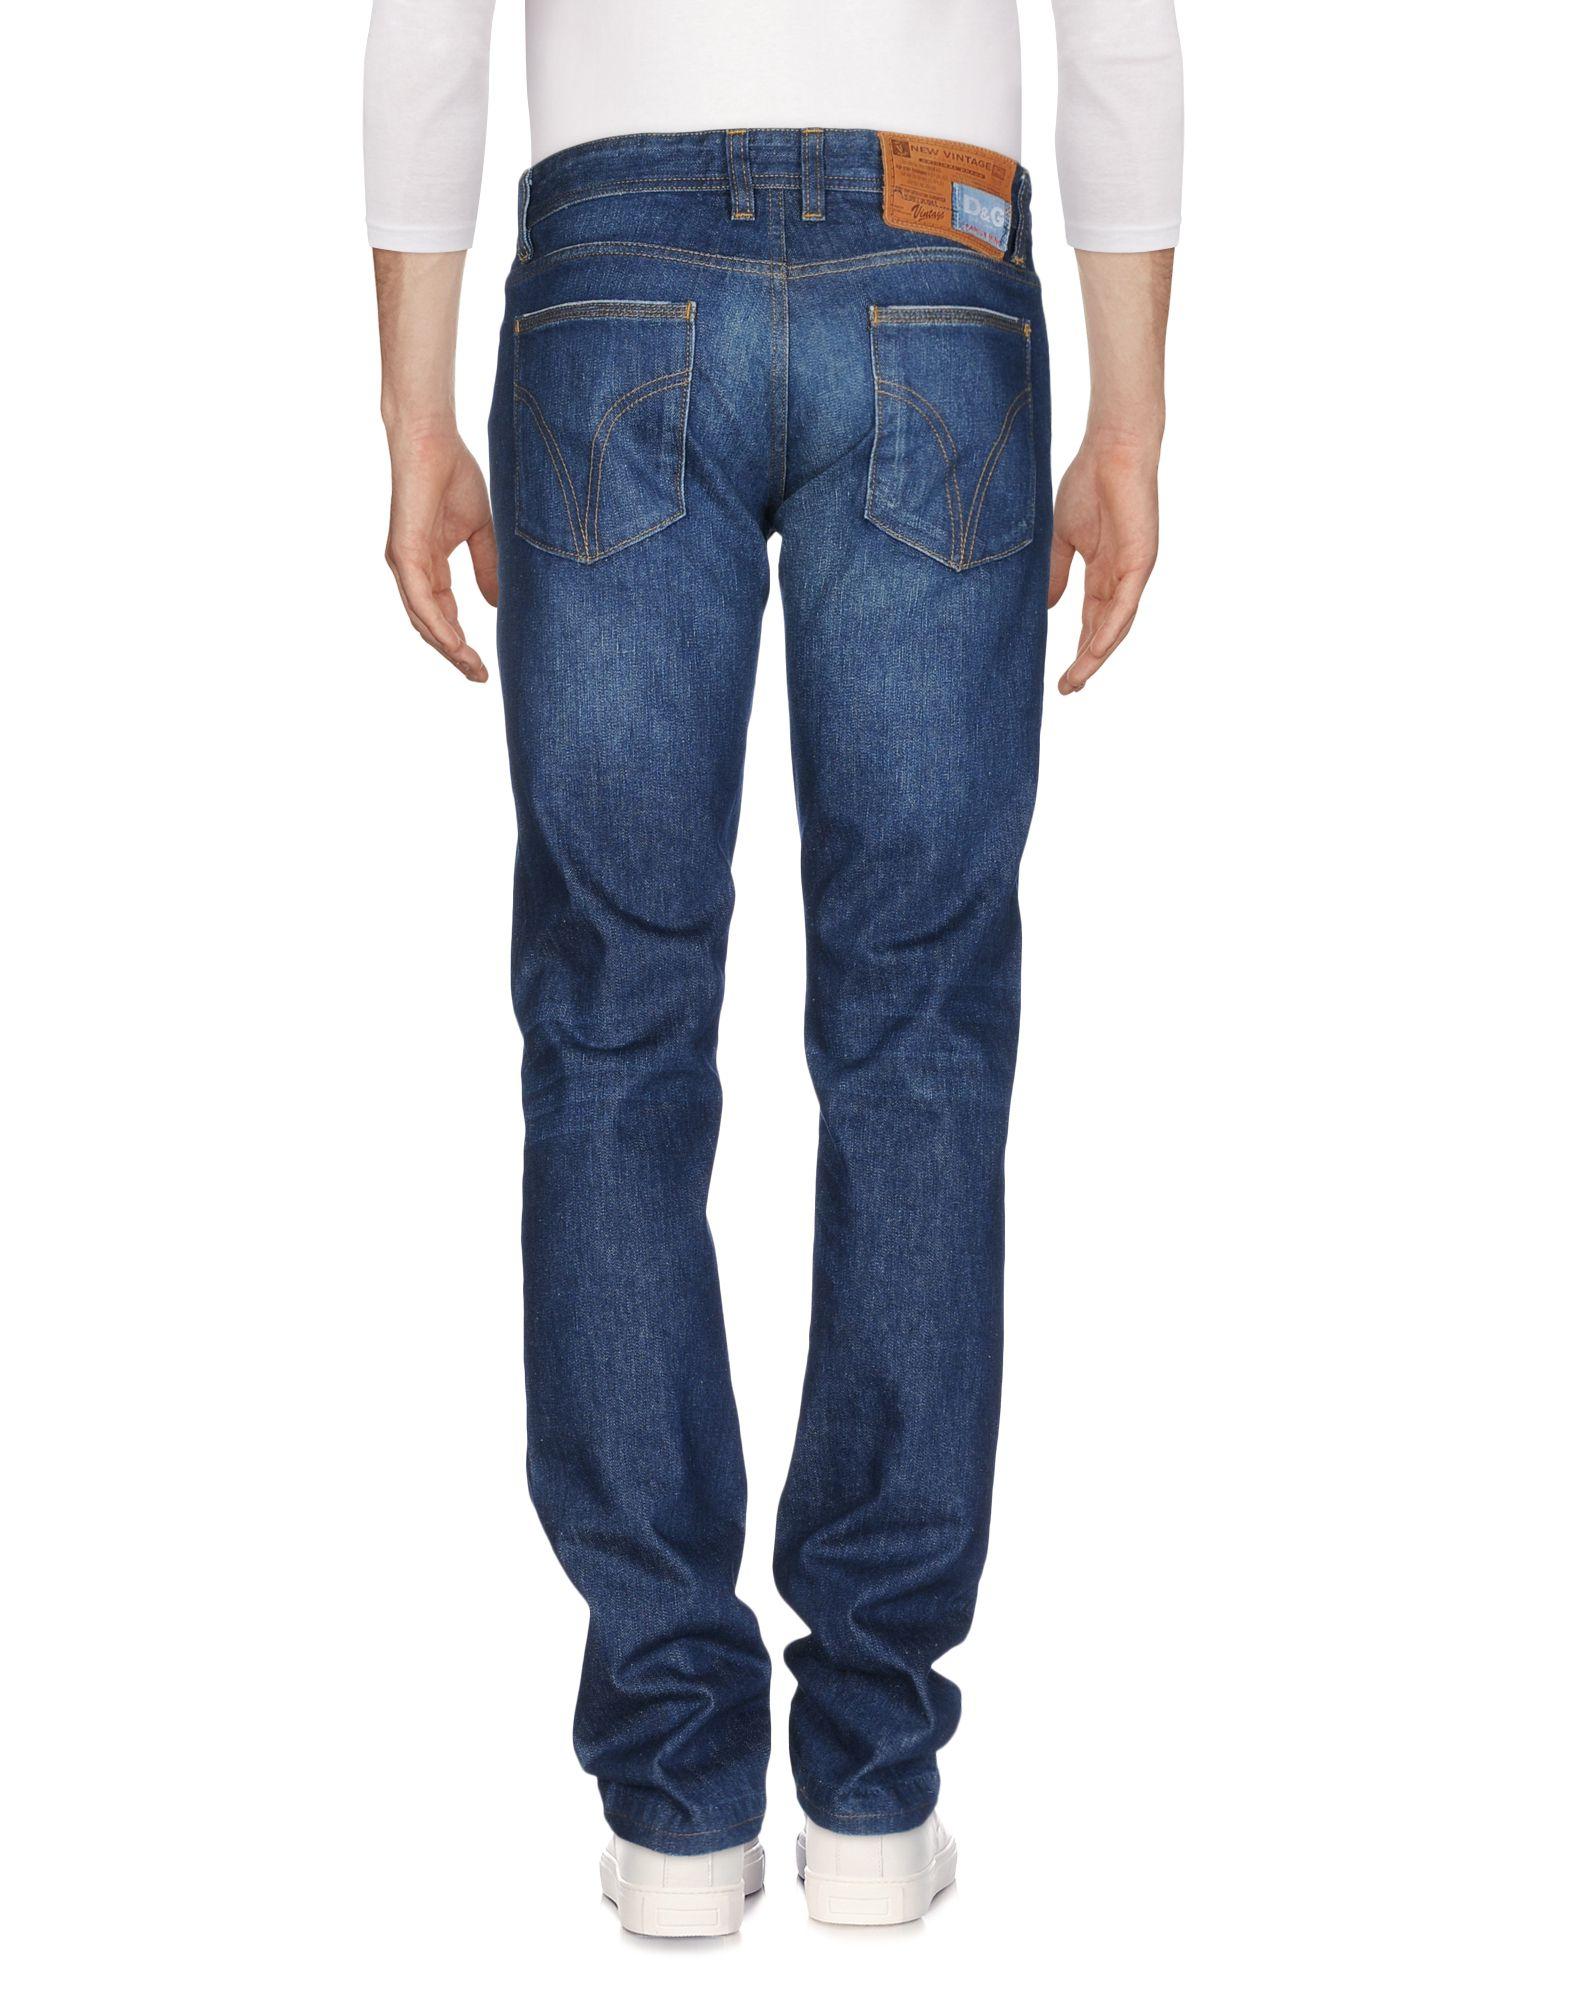 Pantaloni Jeans D&G Uomo - 42656146VE 42656146VE 42656146VE bc7419